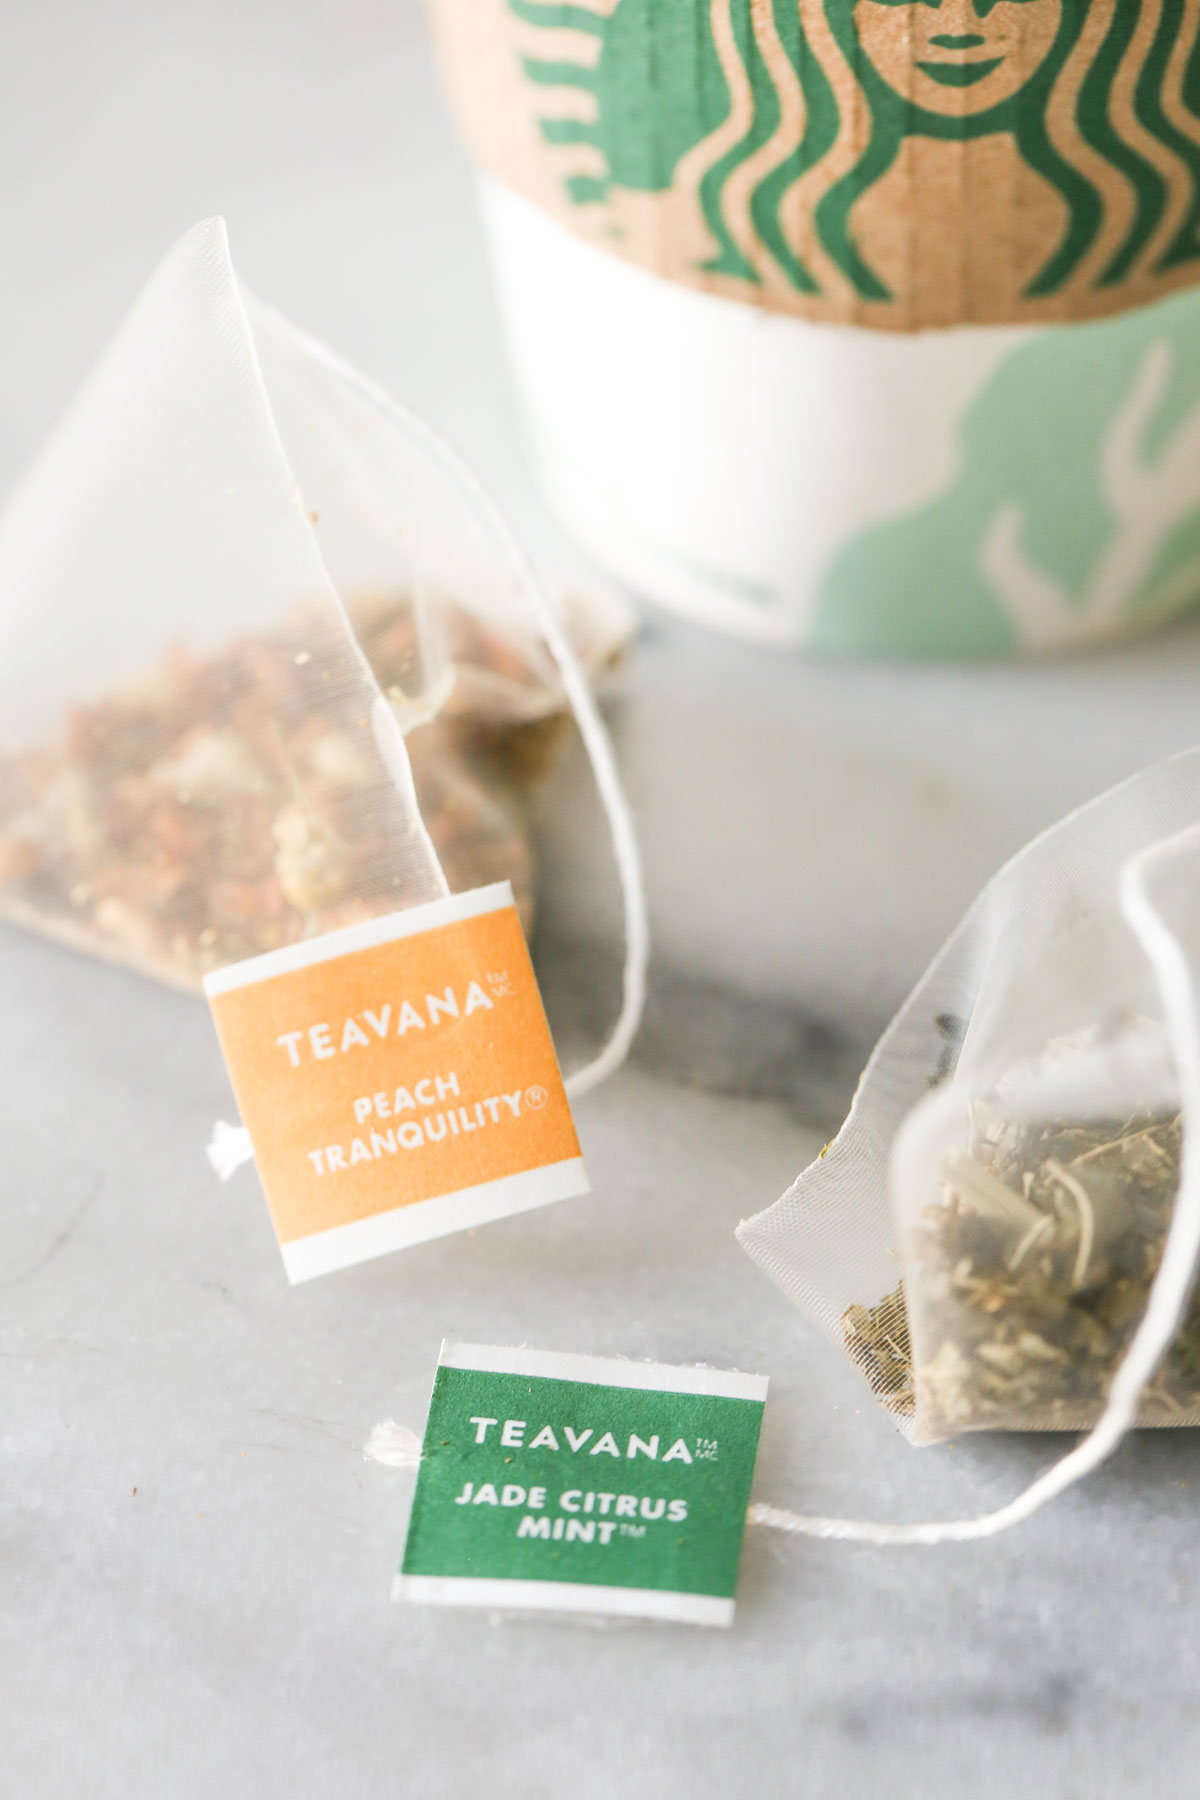 Close up shot of a Teavana Peach Tranquility tea sachet next to a Teavana Jade Citrus Mint tea sachet, with a Starbucks cup in the background.